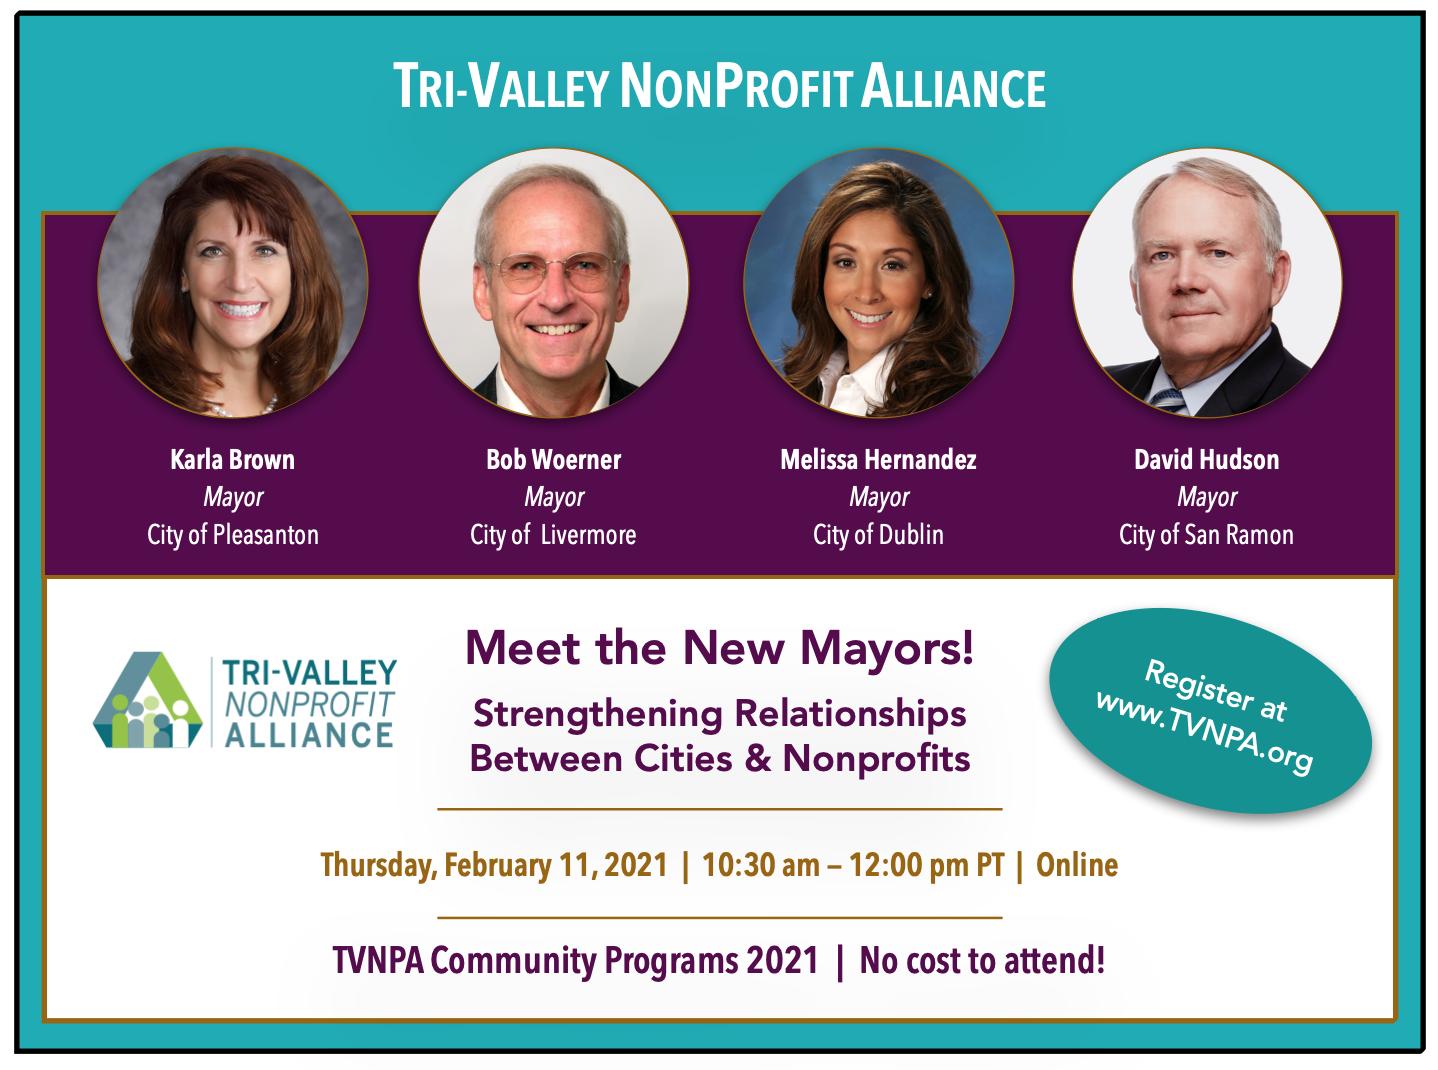 TVNPA Community Program Meet the New Mayors